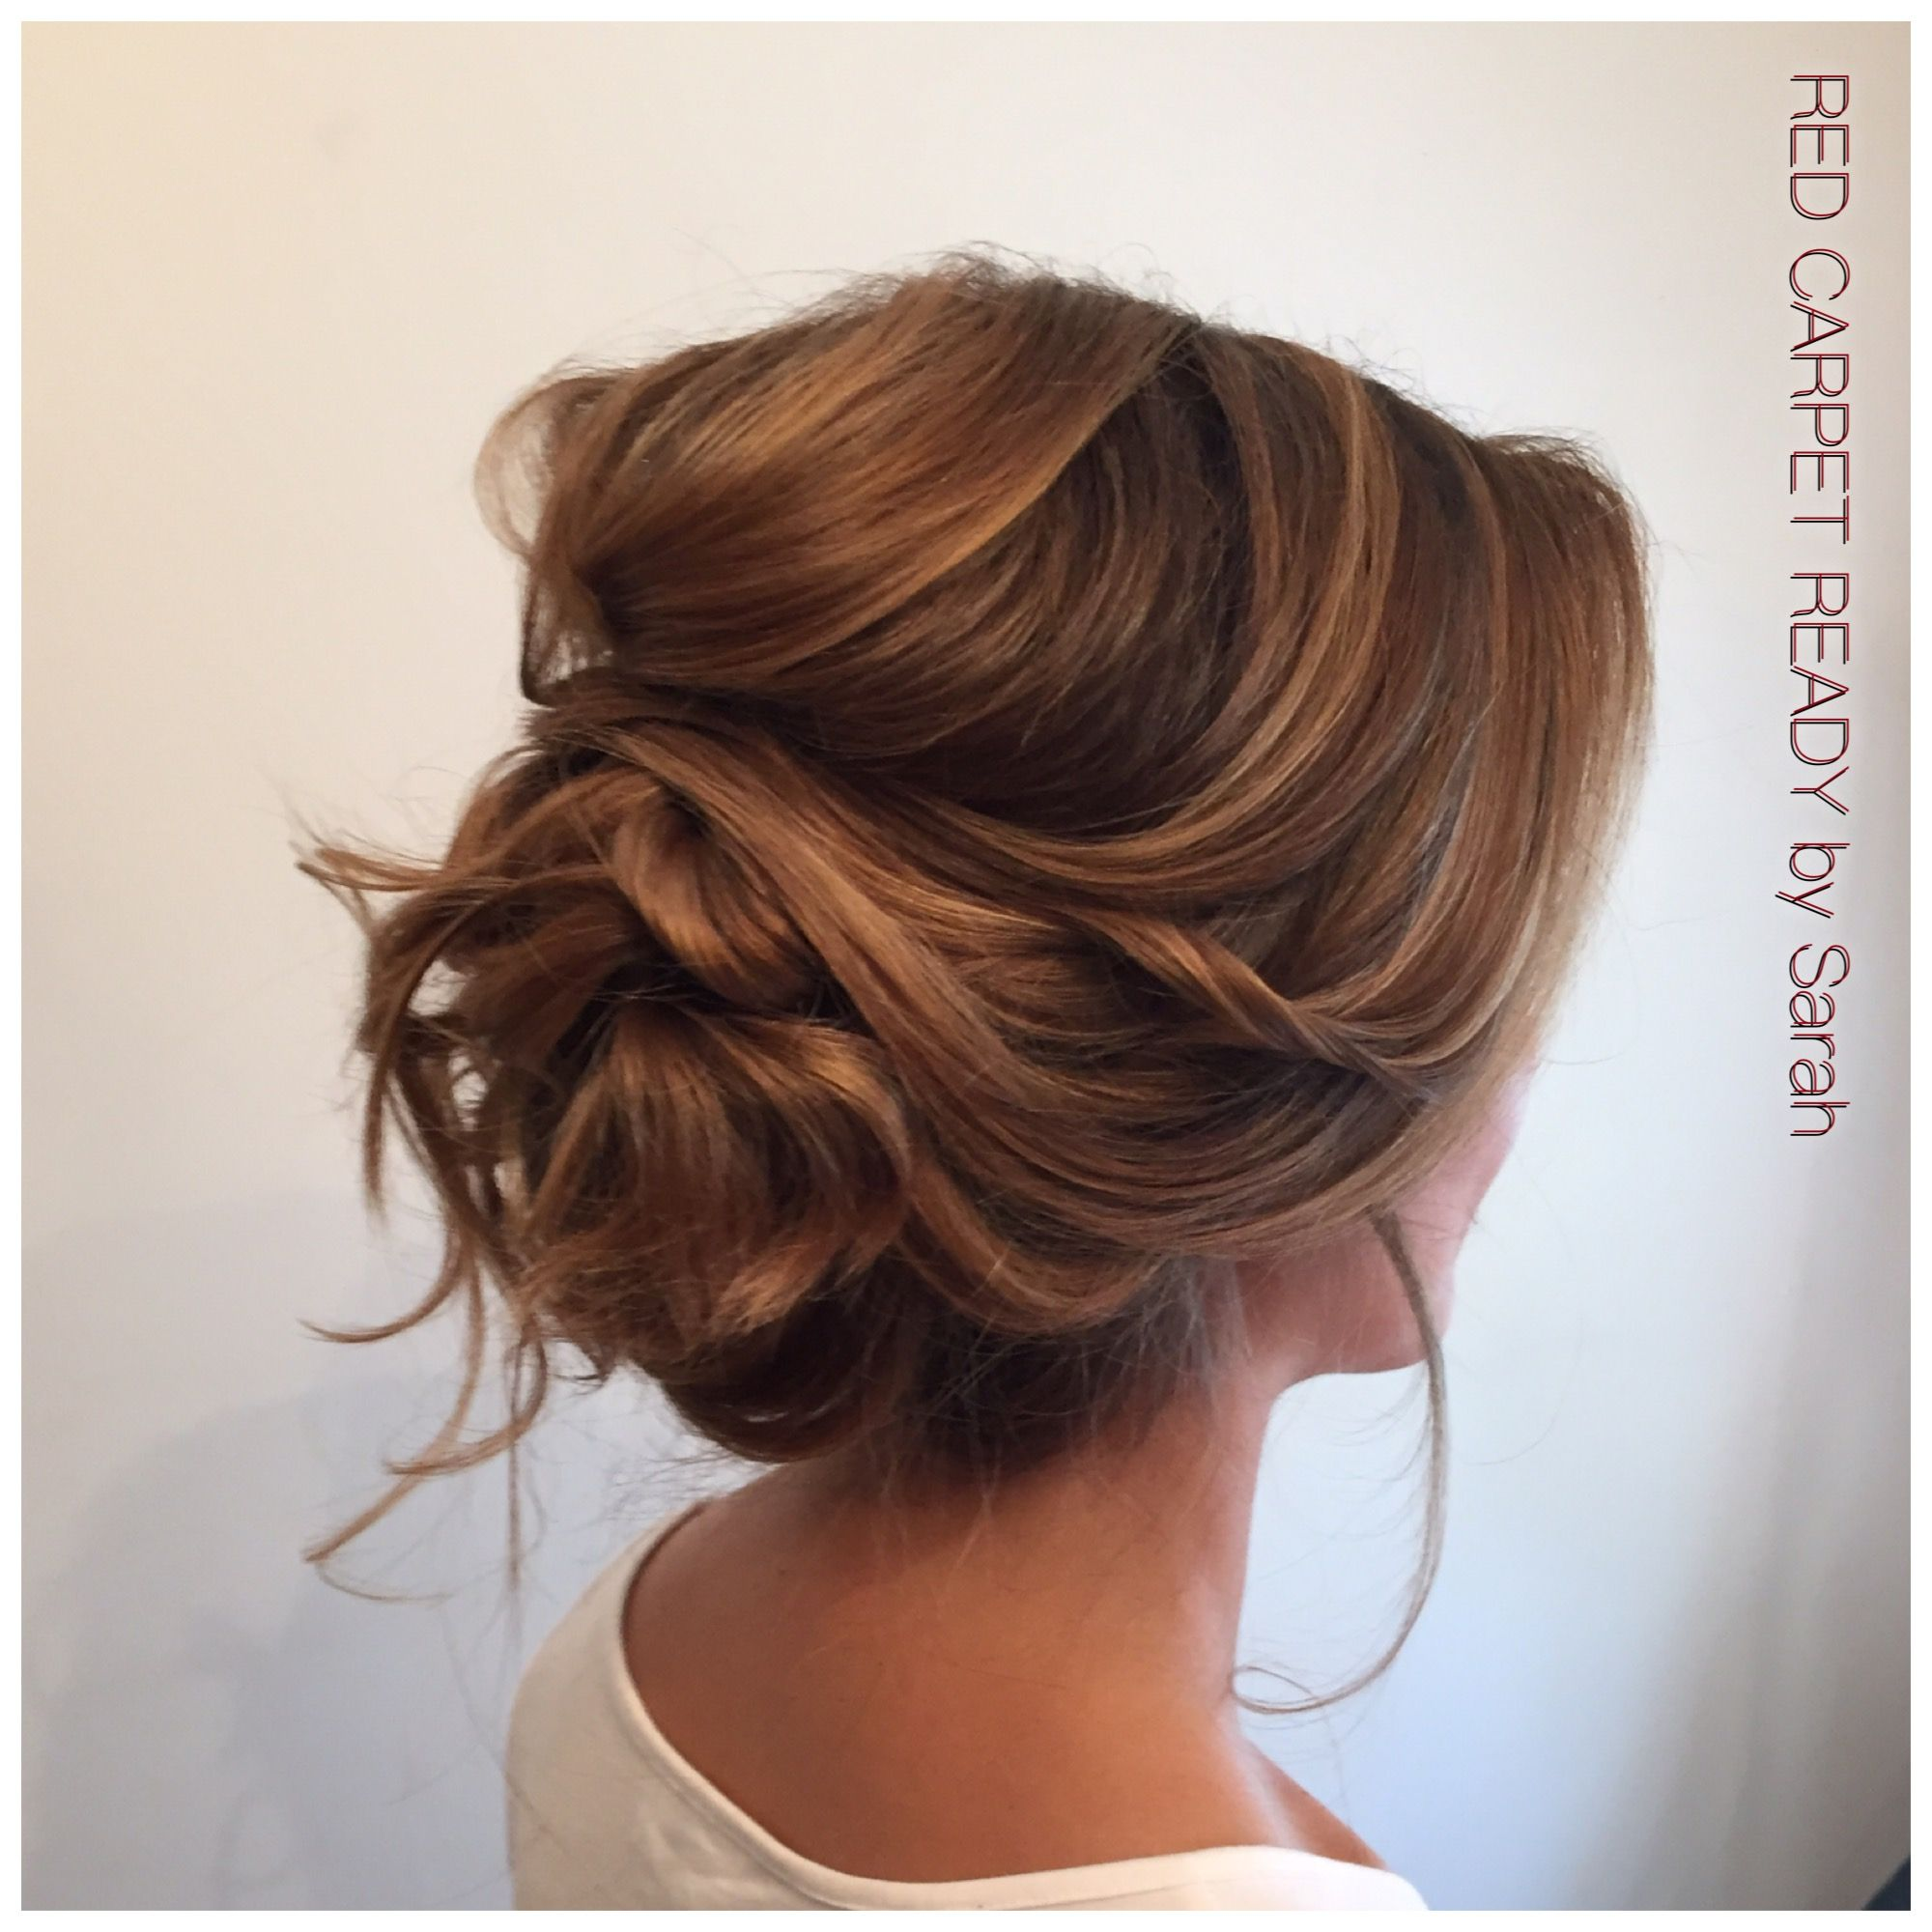 soft low voluminous updo hair by me | wedding hair